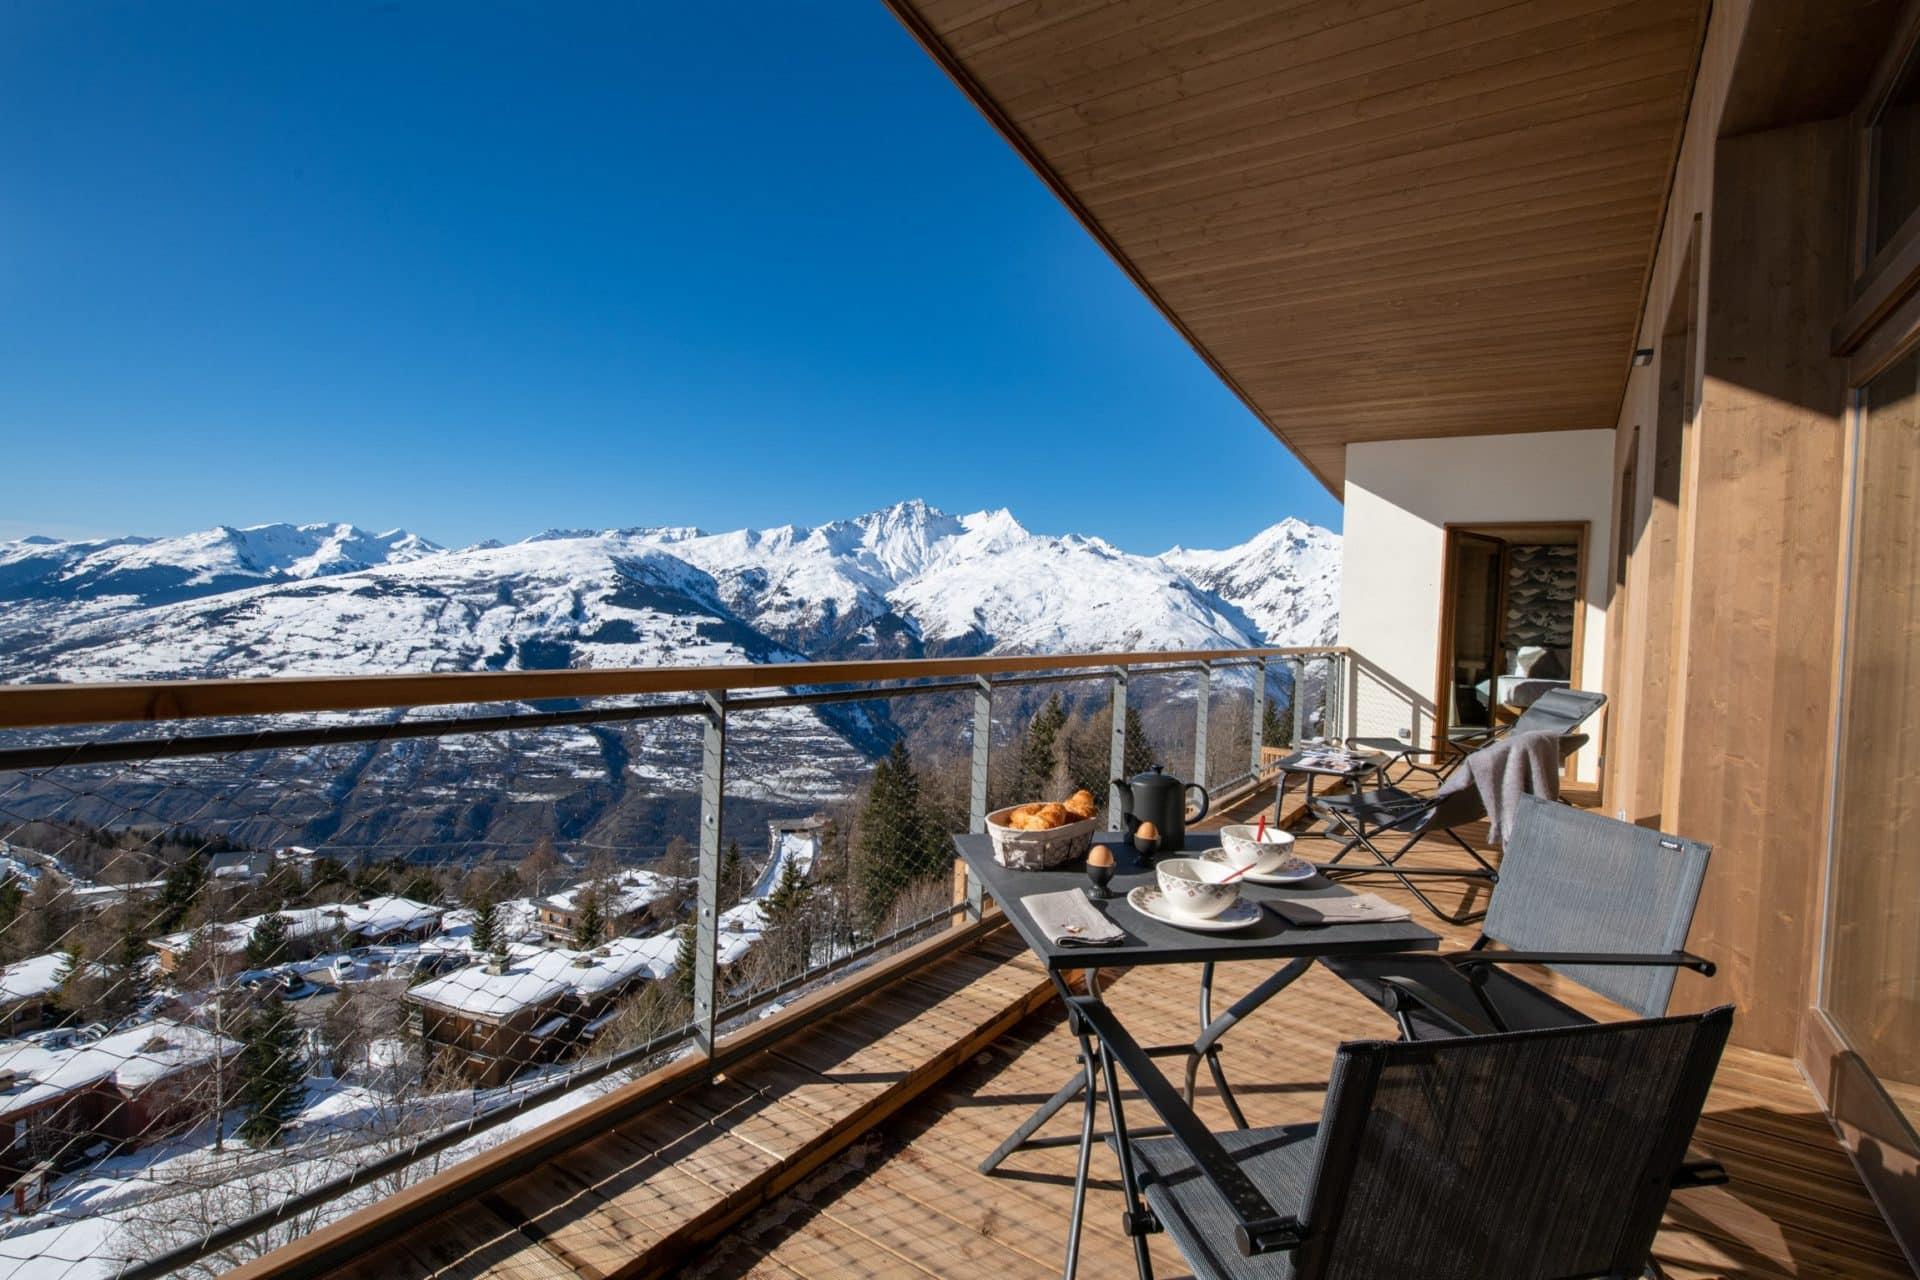 29 Appartement prestige montagne